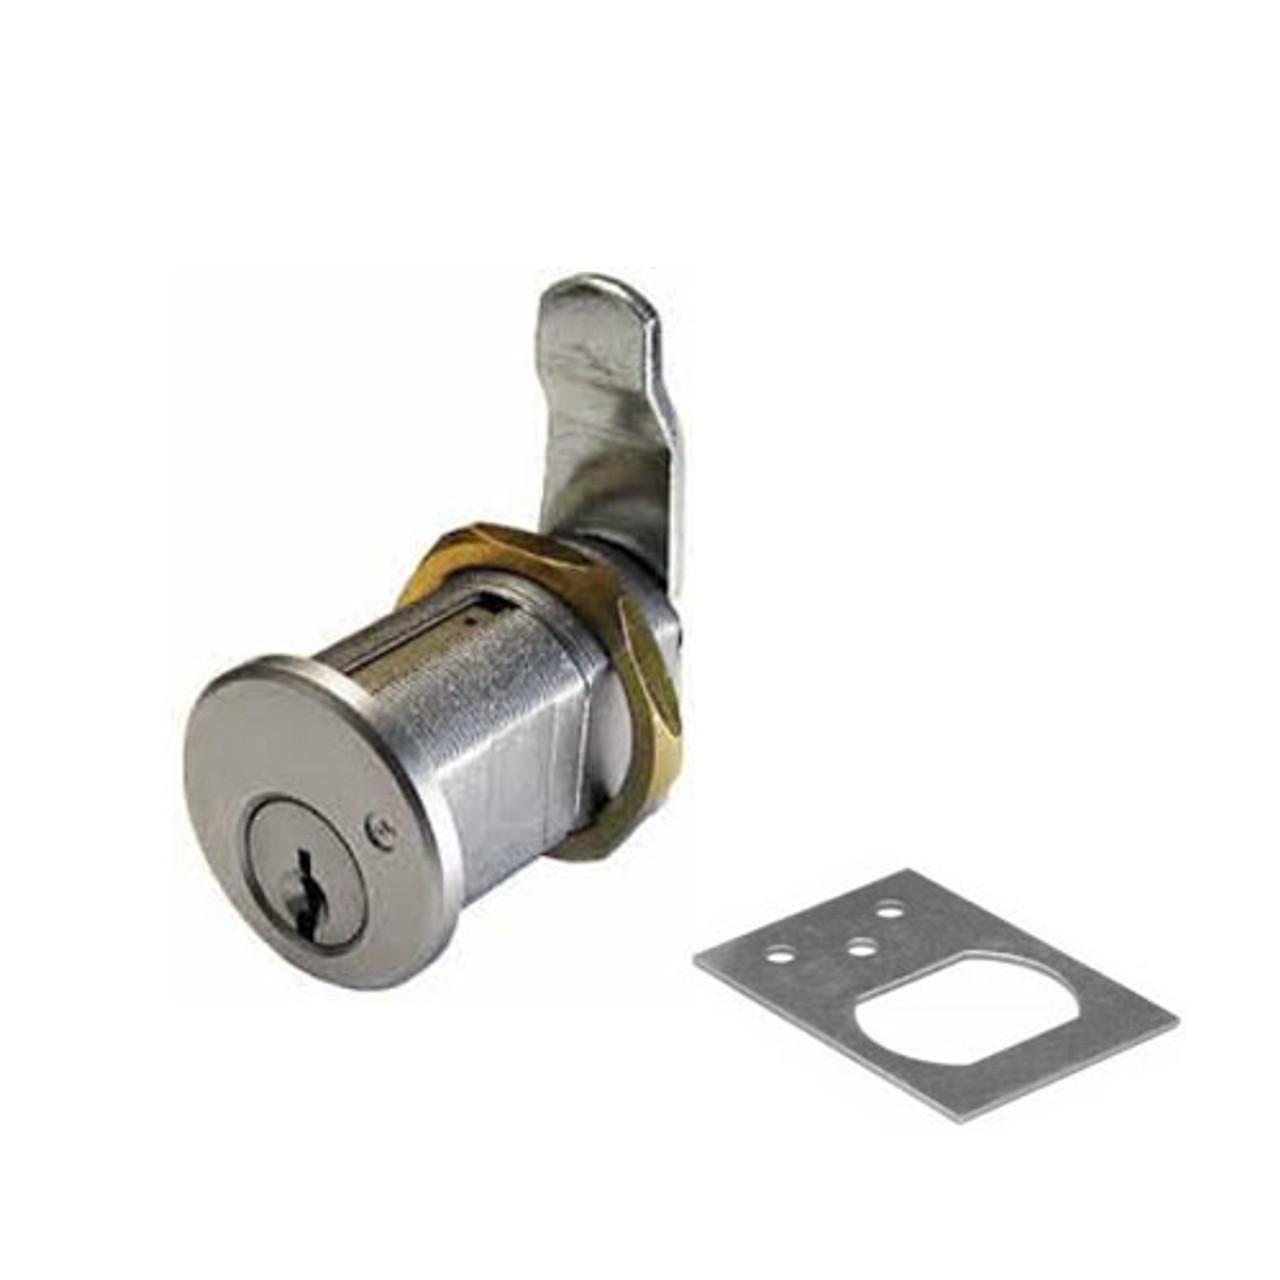 Olympus 820S-KD-26D Cam Locks in Satin Chrome Finish